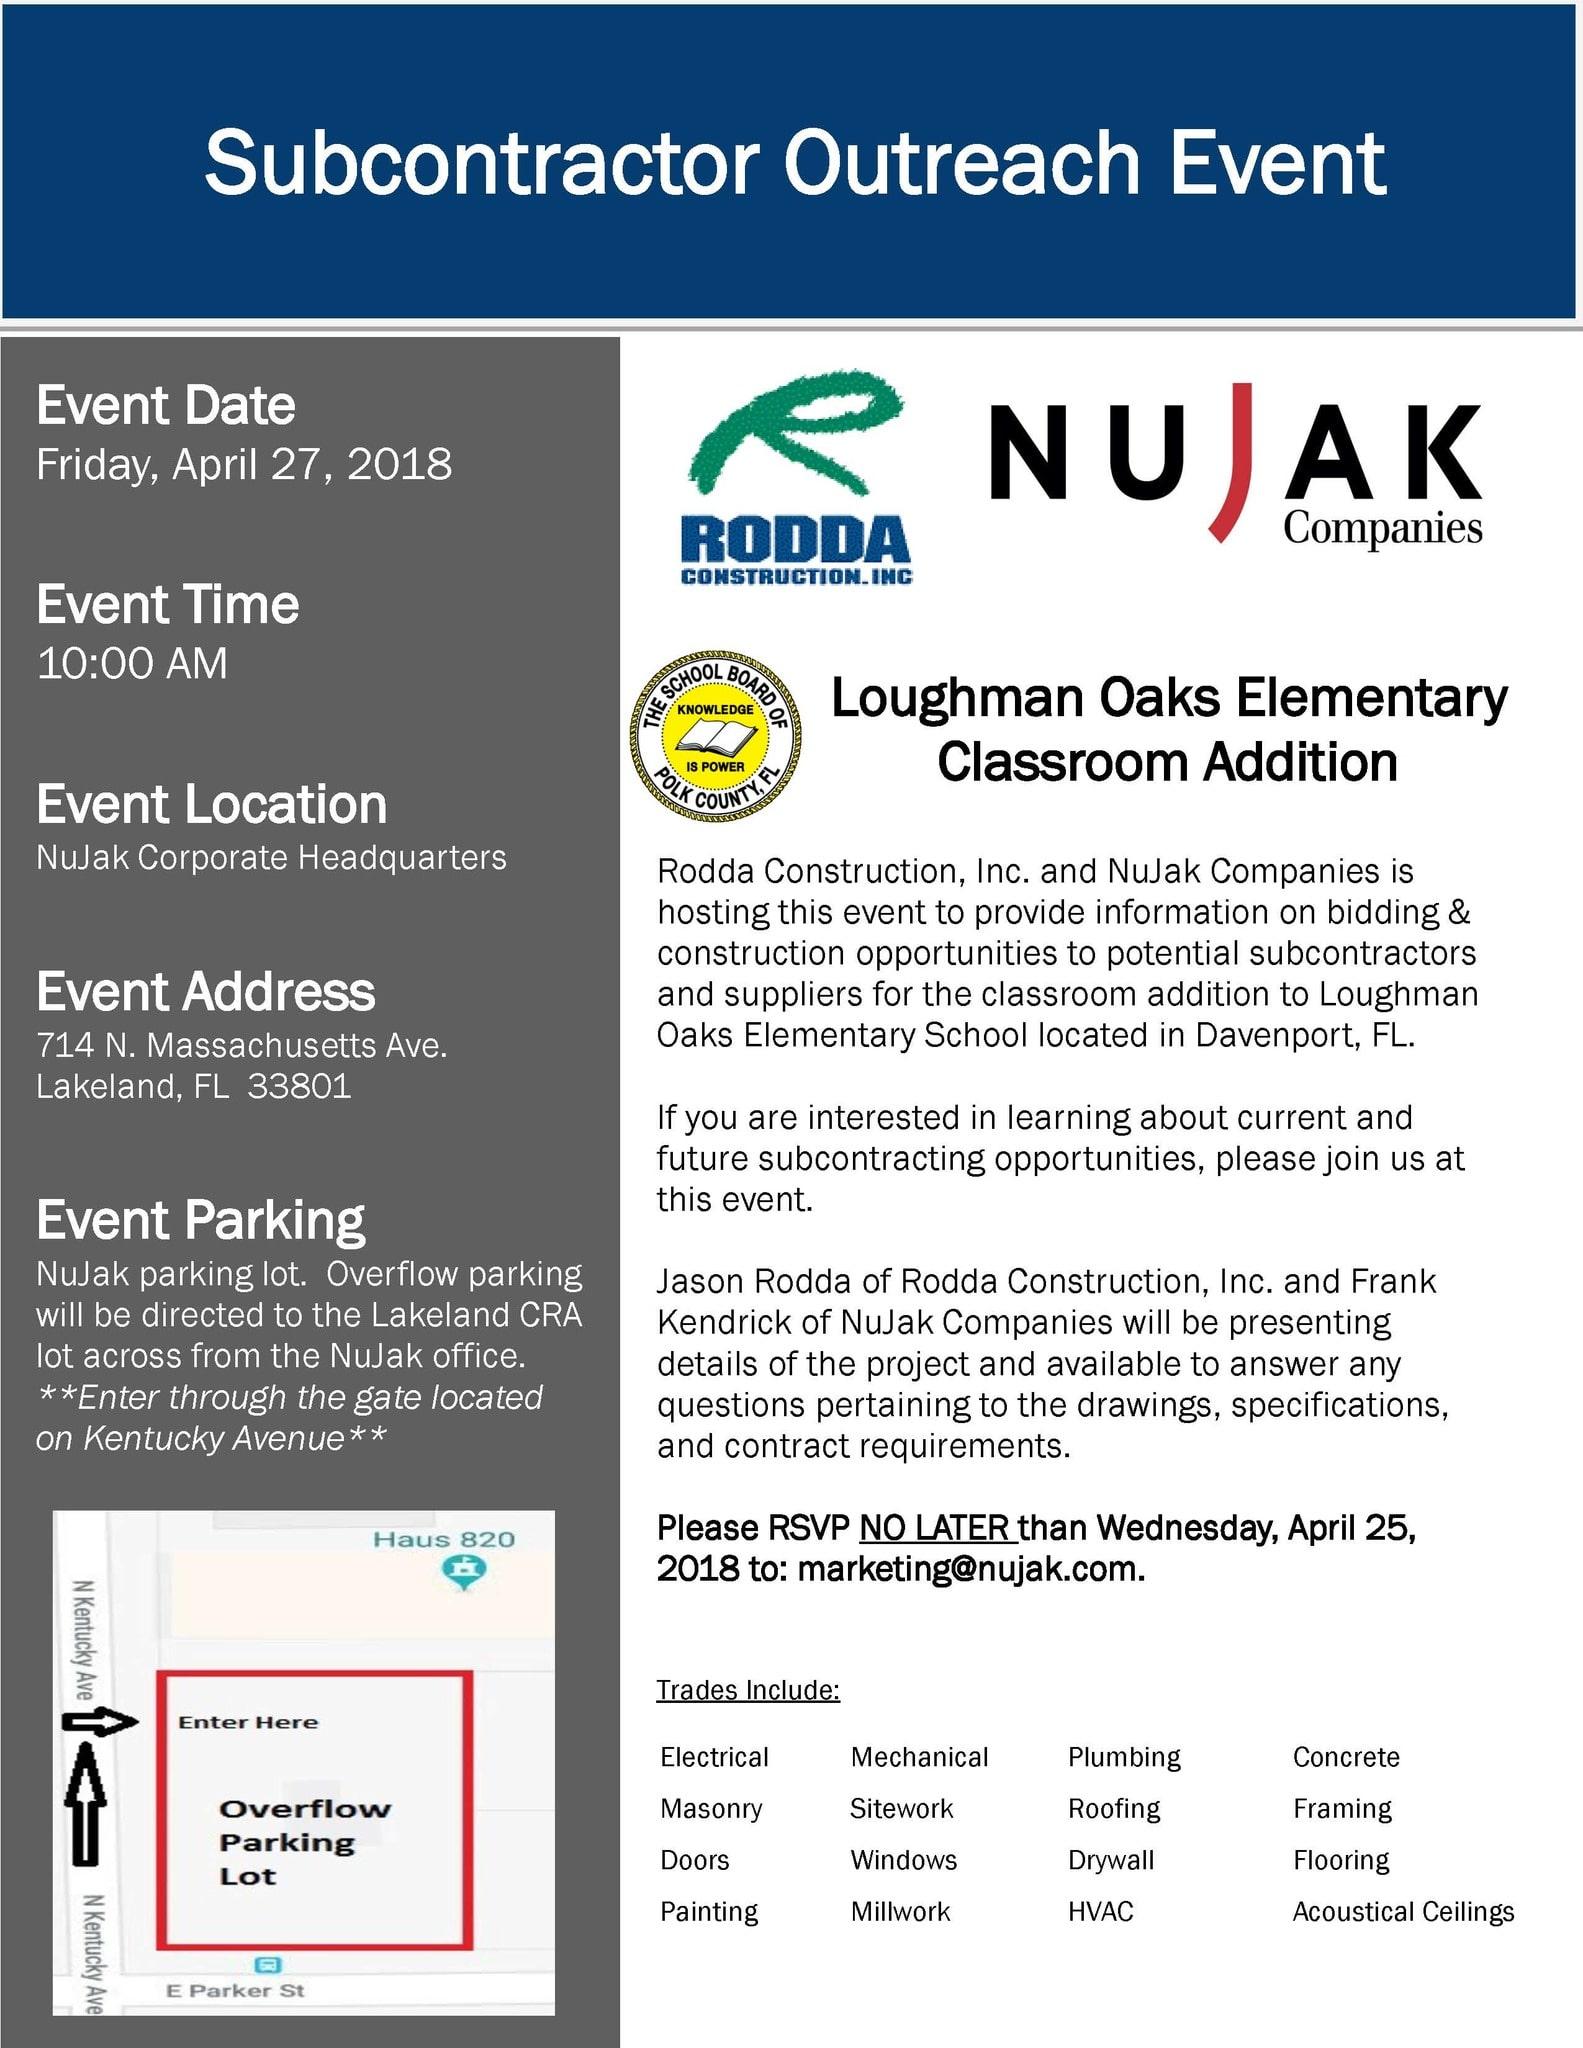 Rodda-NuJak Loughman Oaks Outreach Event Flyer